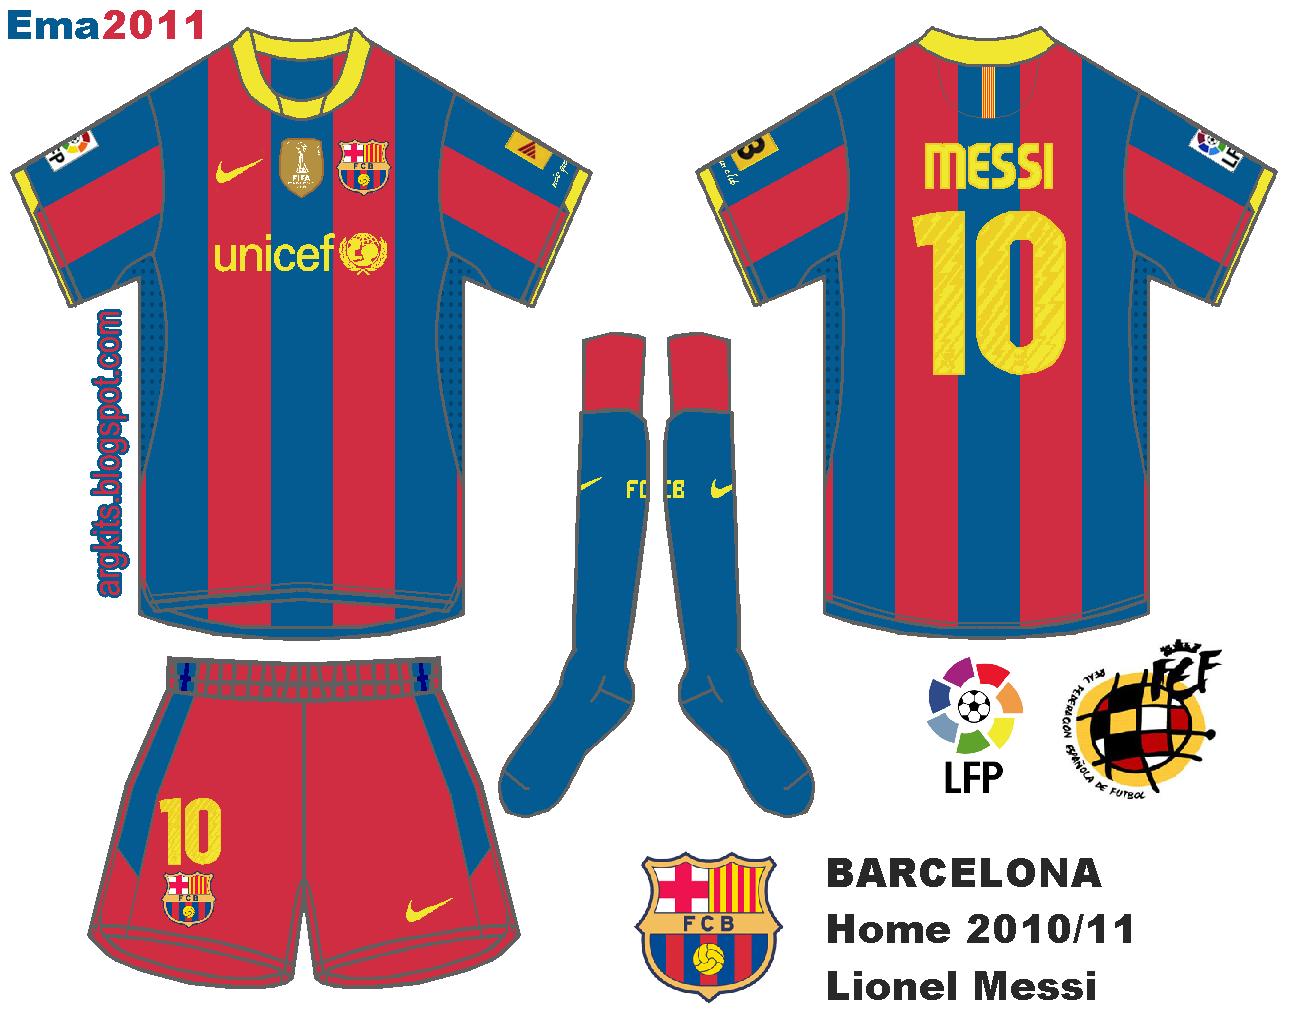 Imagenes De Escudos De Futbol Mundial - Escudos de equipos de fútbol Liga Fútbol